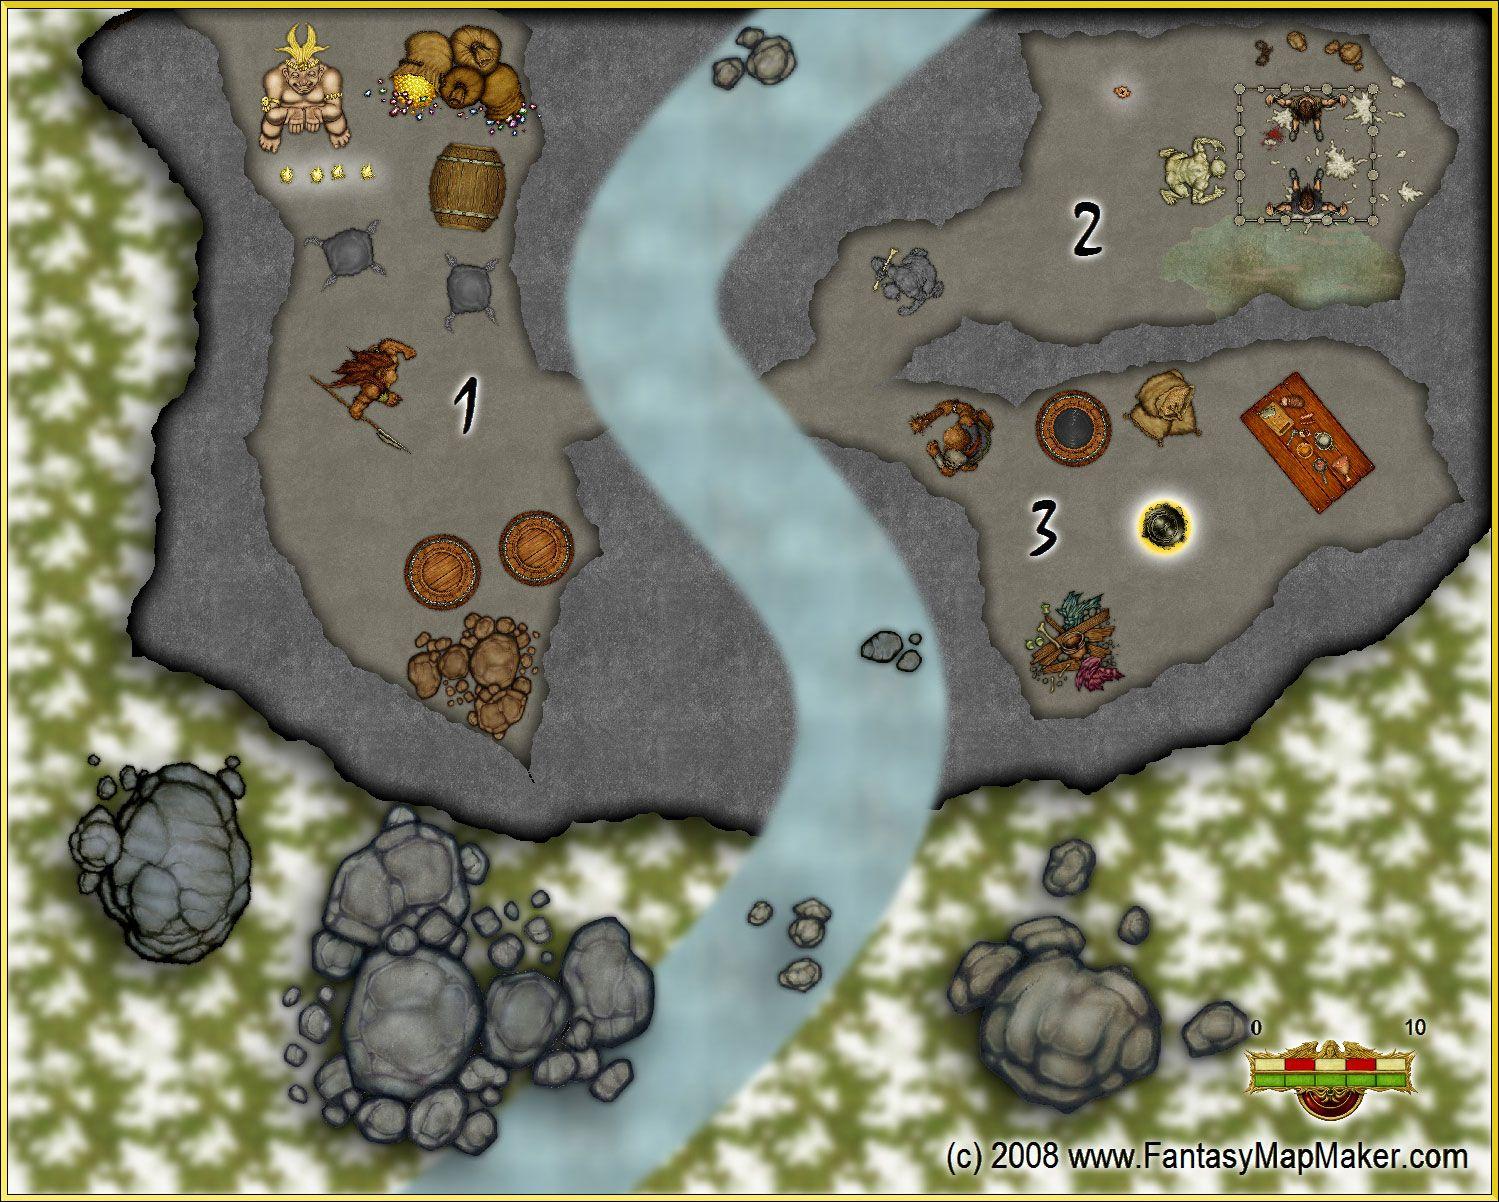 stone-hill-hideout.jpg (immagine JPEG, 1499×1202 pixel)